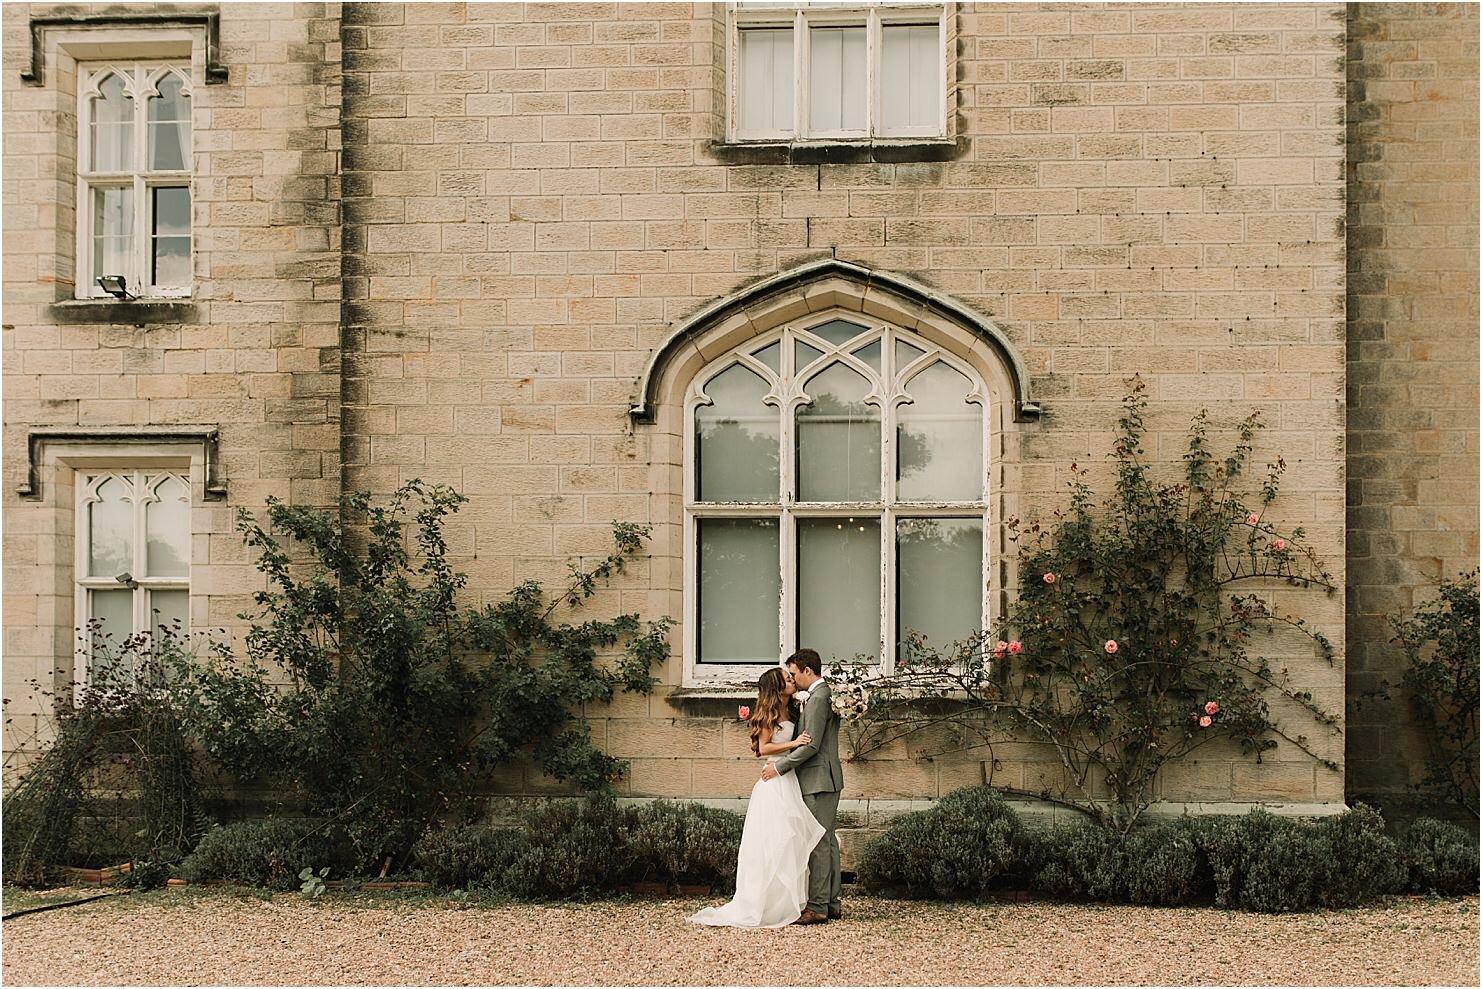 boda-de-cuento-en-castillo-boda-en-londres-63.jpg